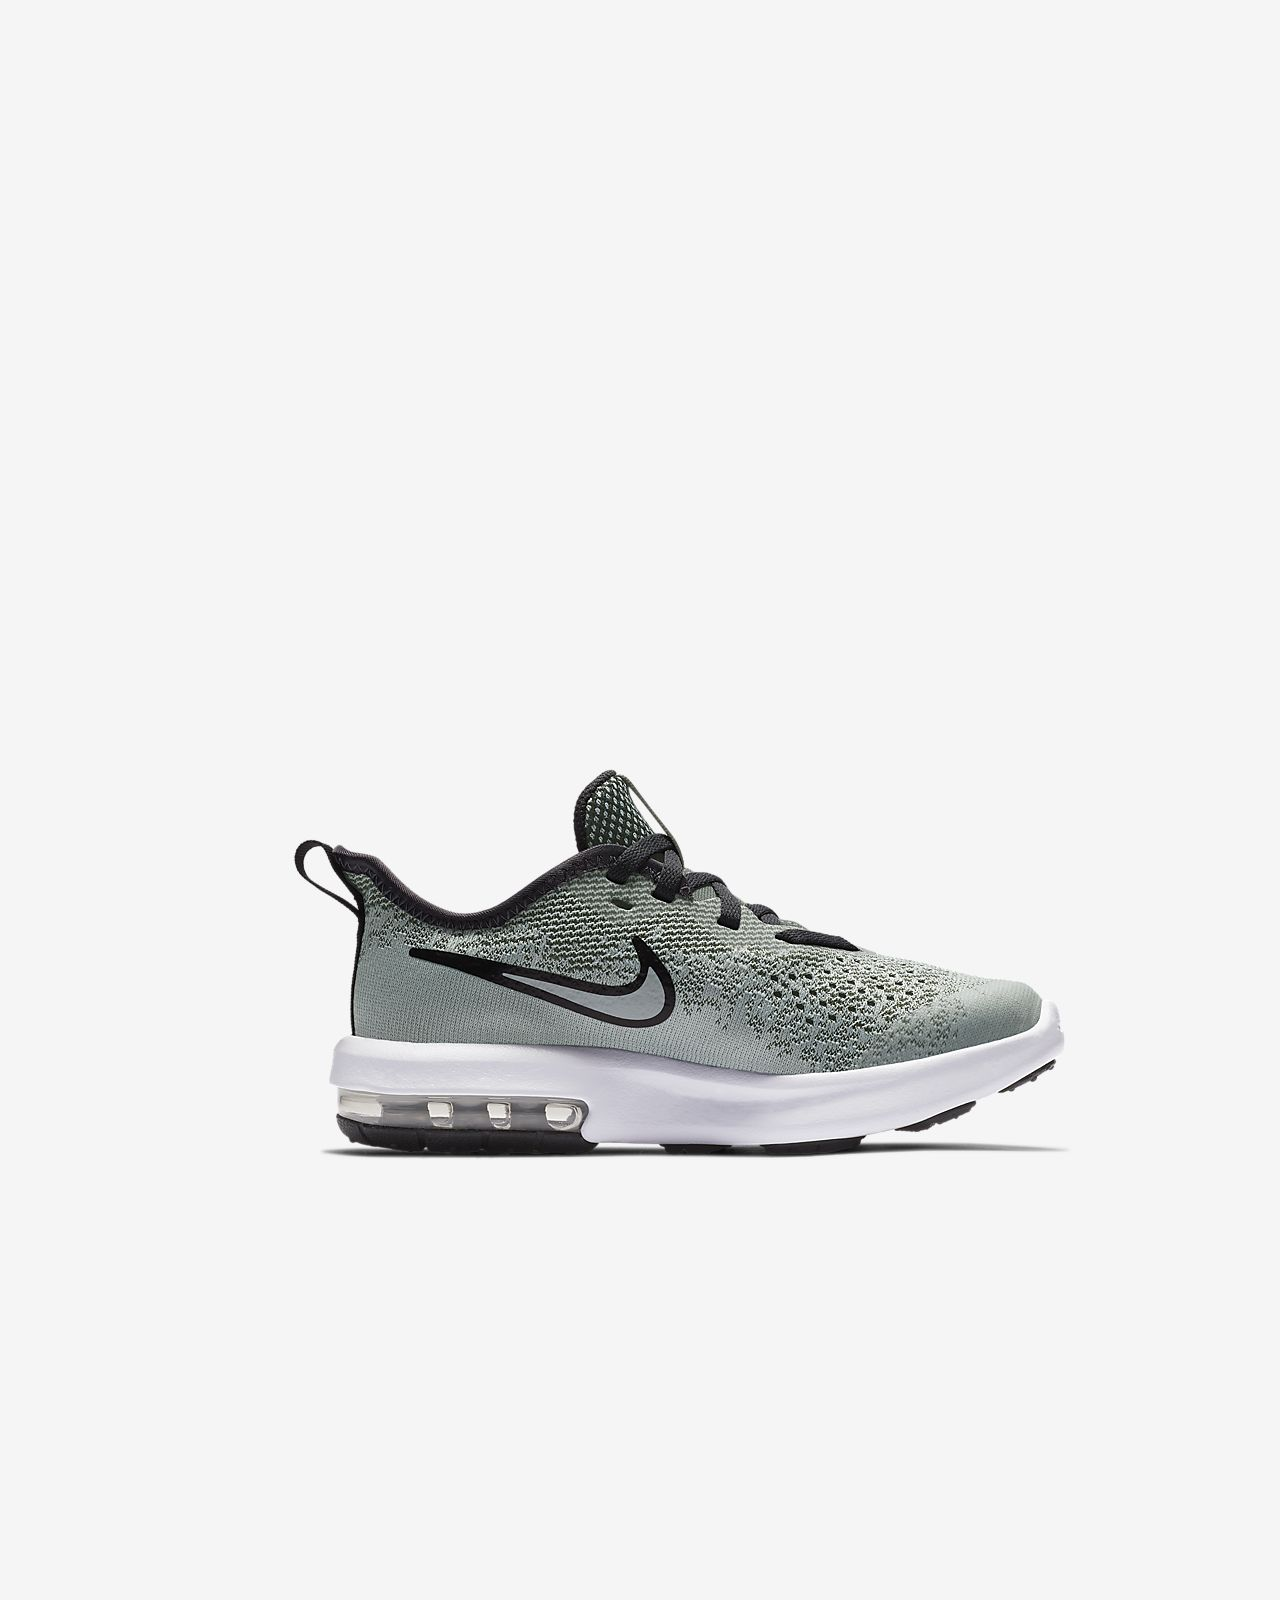 639ba8f9a5ba6 Chaussure Nike Air Max Sequent 4 pour Jeune enfant. Nike.com MA